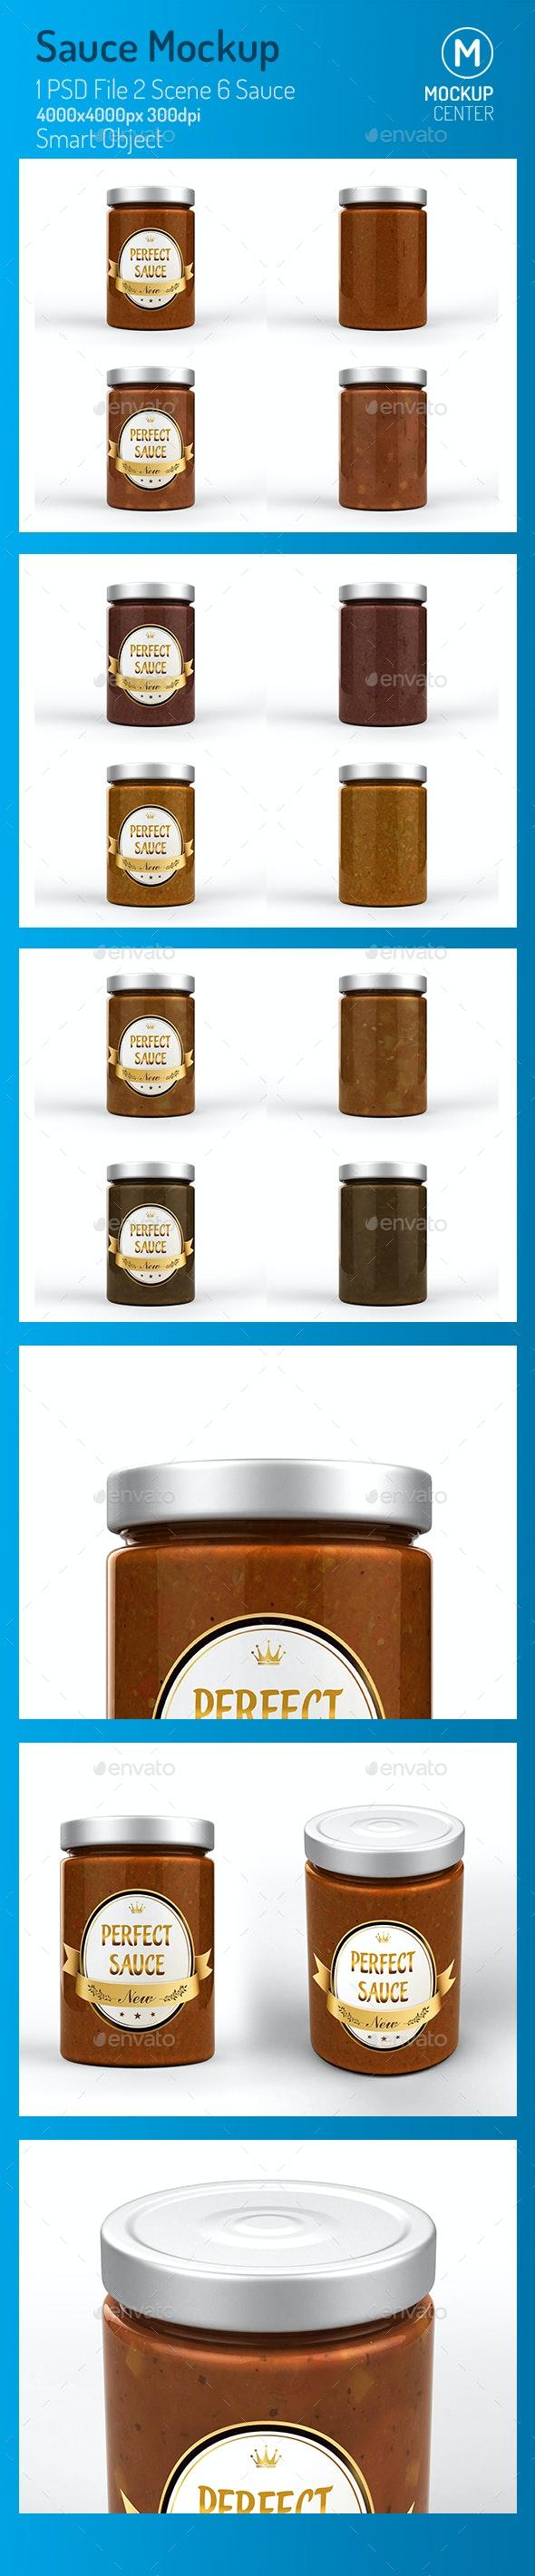 Sauce Jar Mockup - Product Mock-Ups Graphics